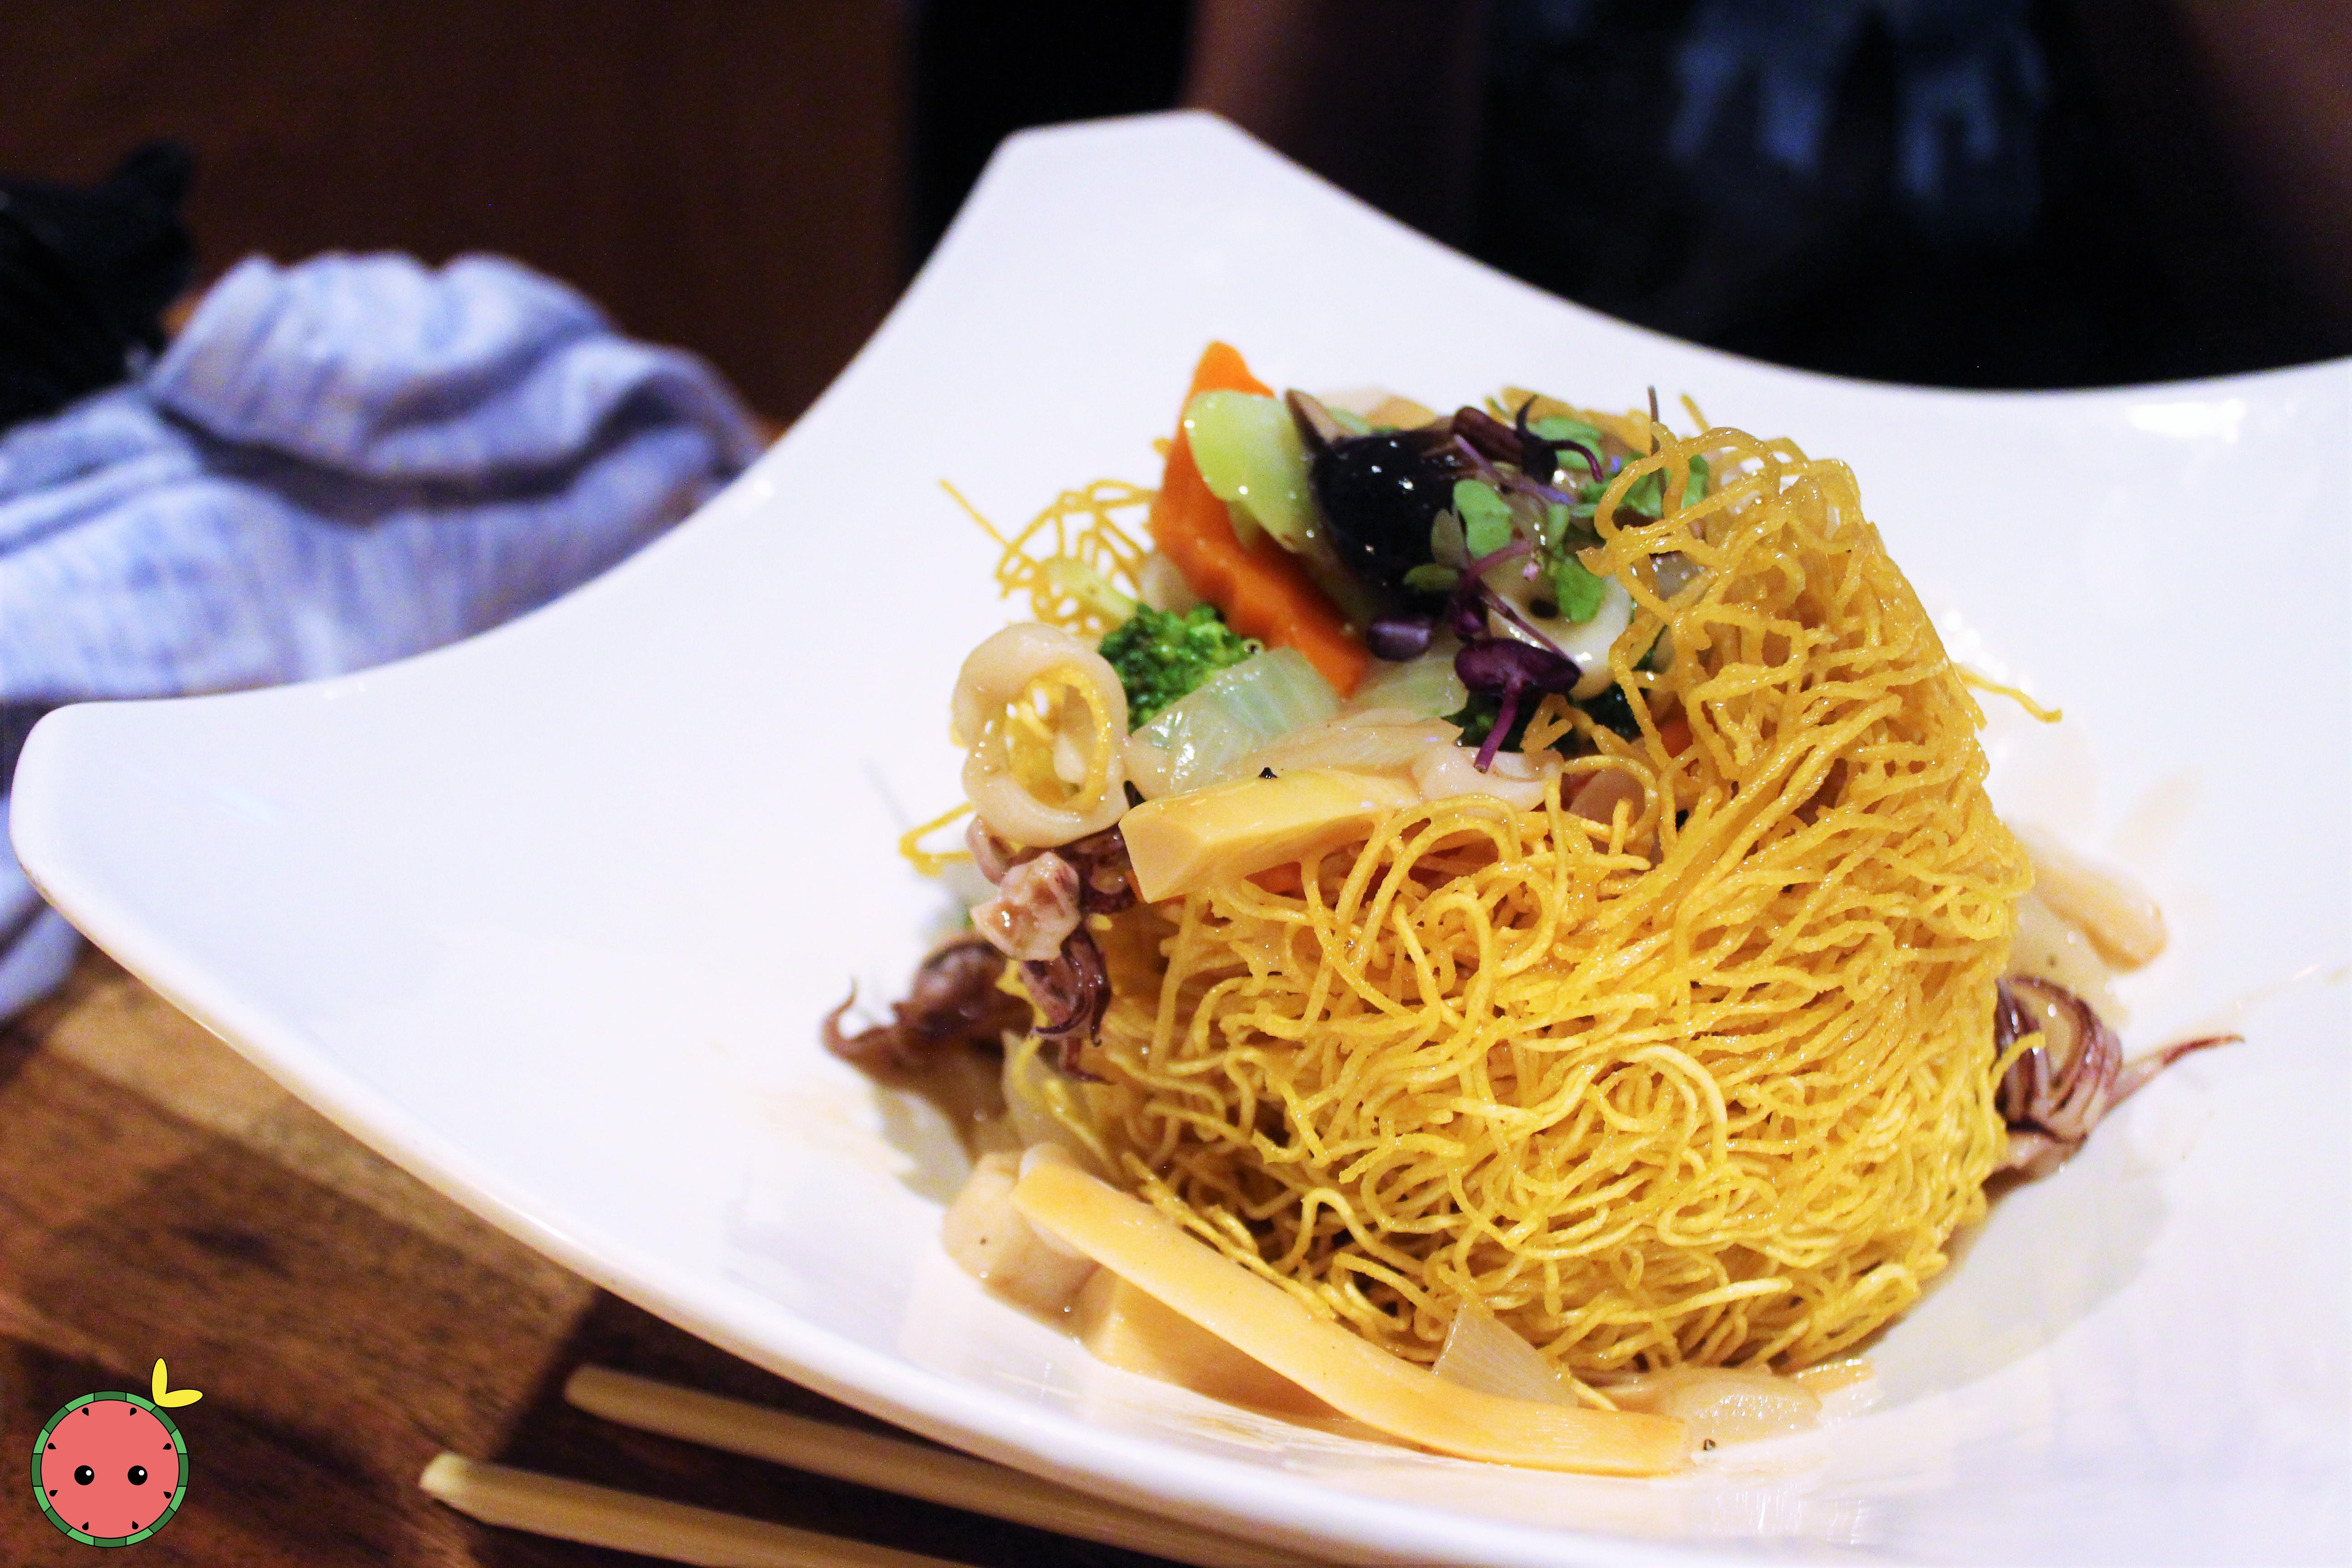 Pan Fried Noodles  with Calamari, Shrimp, Scallops, Onions, Broccoli, Mushrooms, Carrots, Bamboo, &